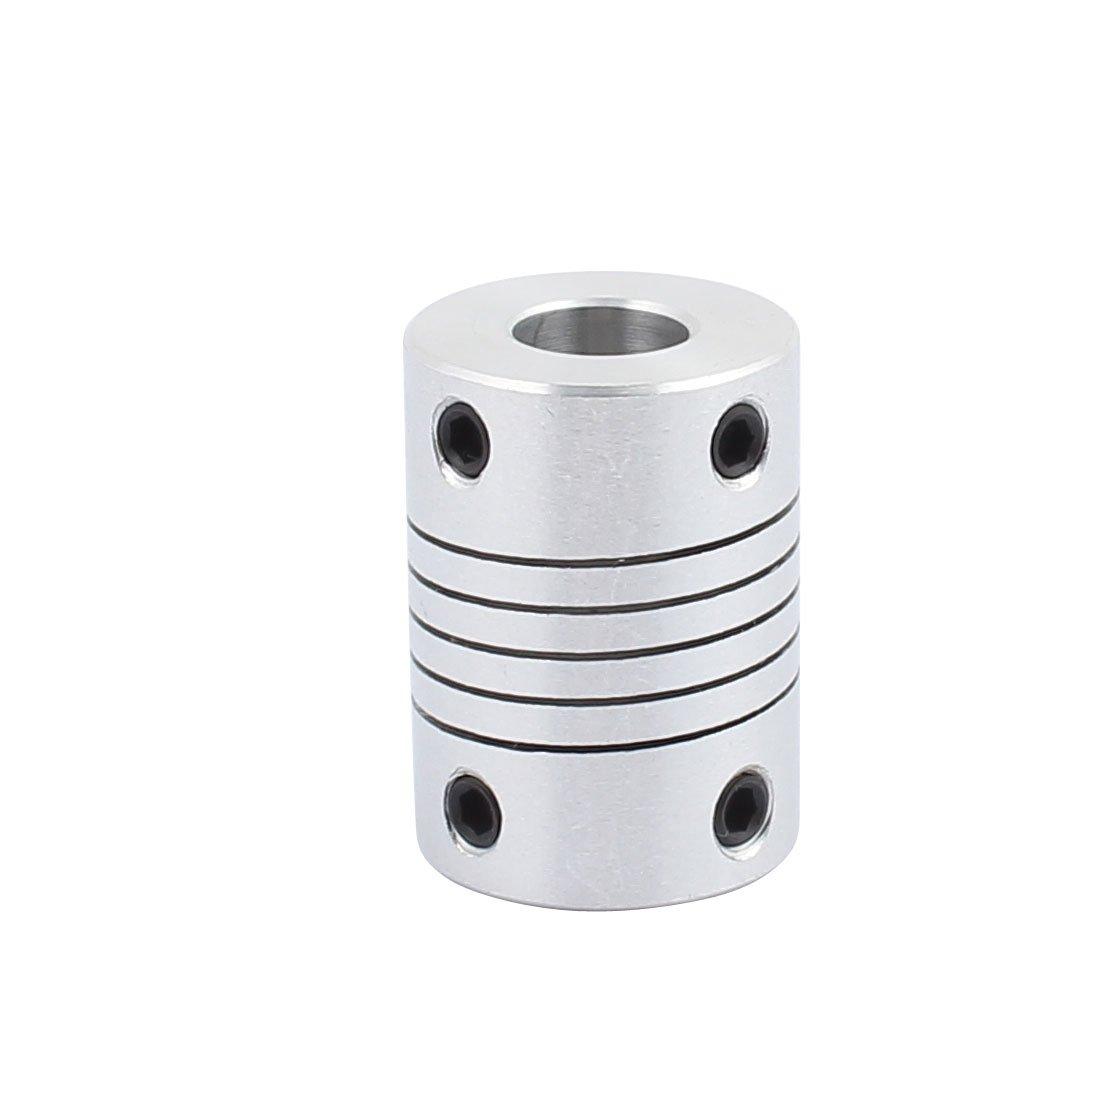 uxcell 8mm to 8mm Shaft Coupling 25mm Length 18mm Diameter Stepper Motor Coupler Aluminum Alloy Joint Connector for 3D Printer CNC Machine DIY Encoder